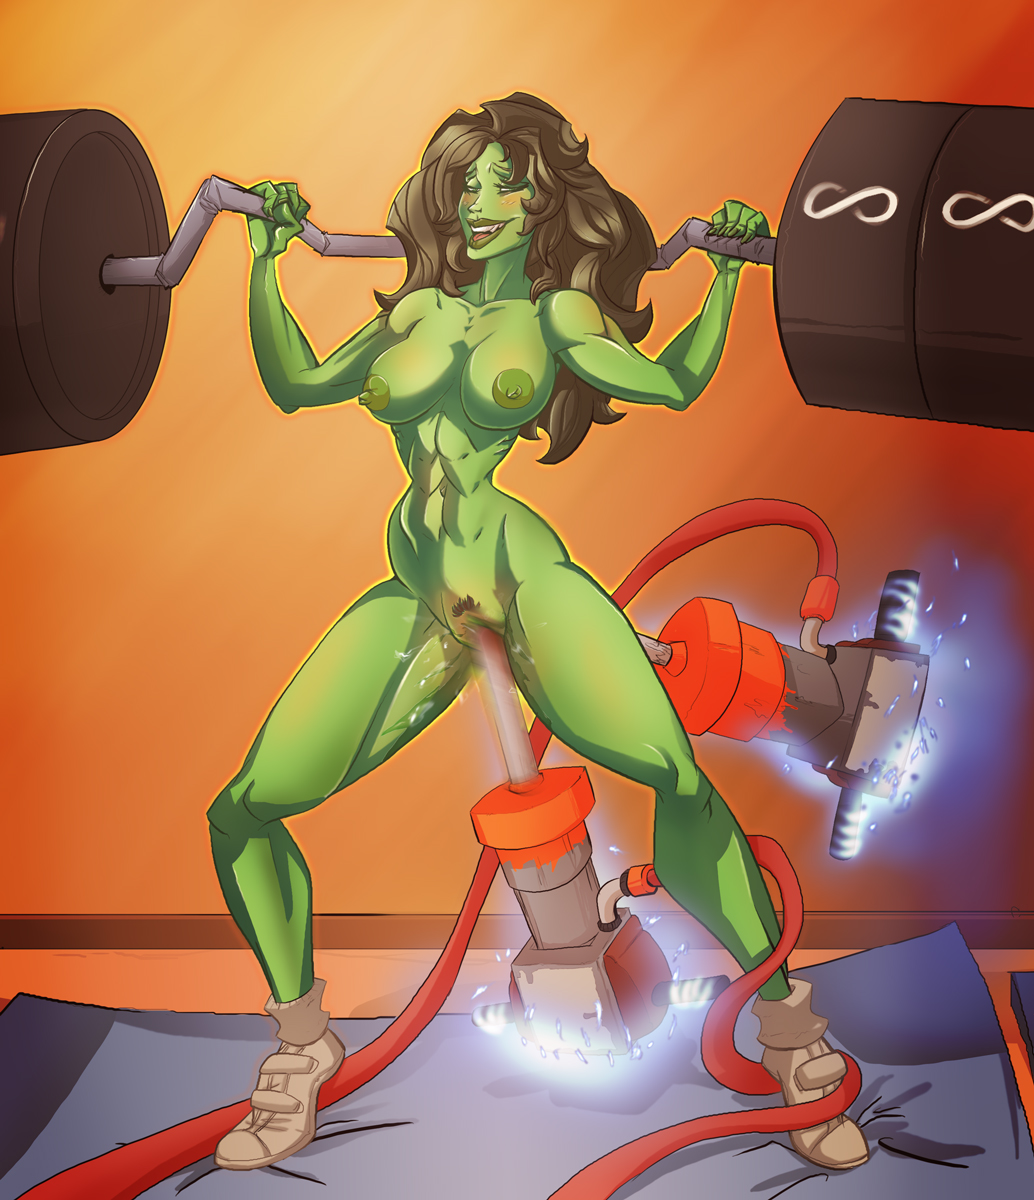 She hulk porn sex were